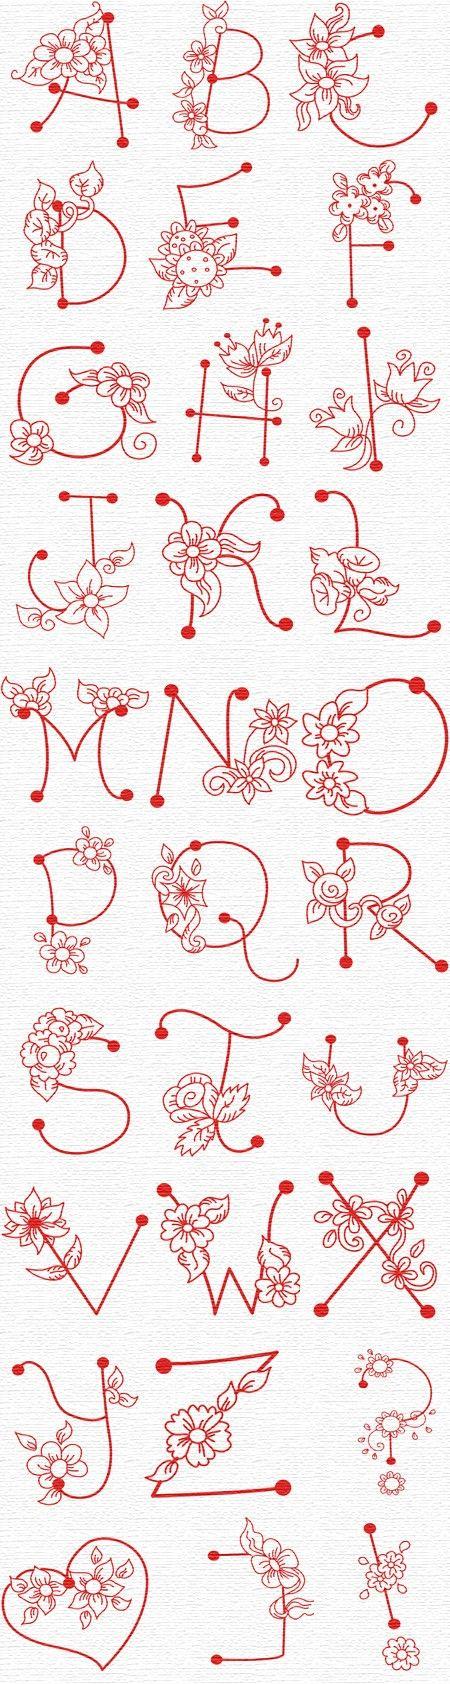 Alfabeto bordado | Letras | Pinterest | Bordado, Alfabeto bordado y ...